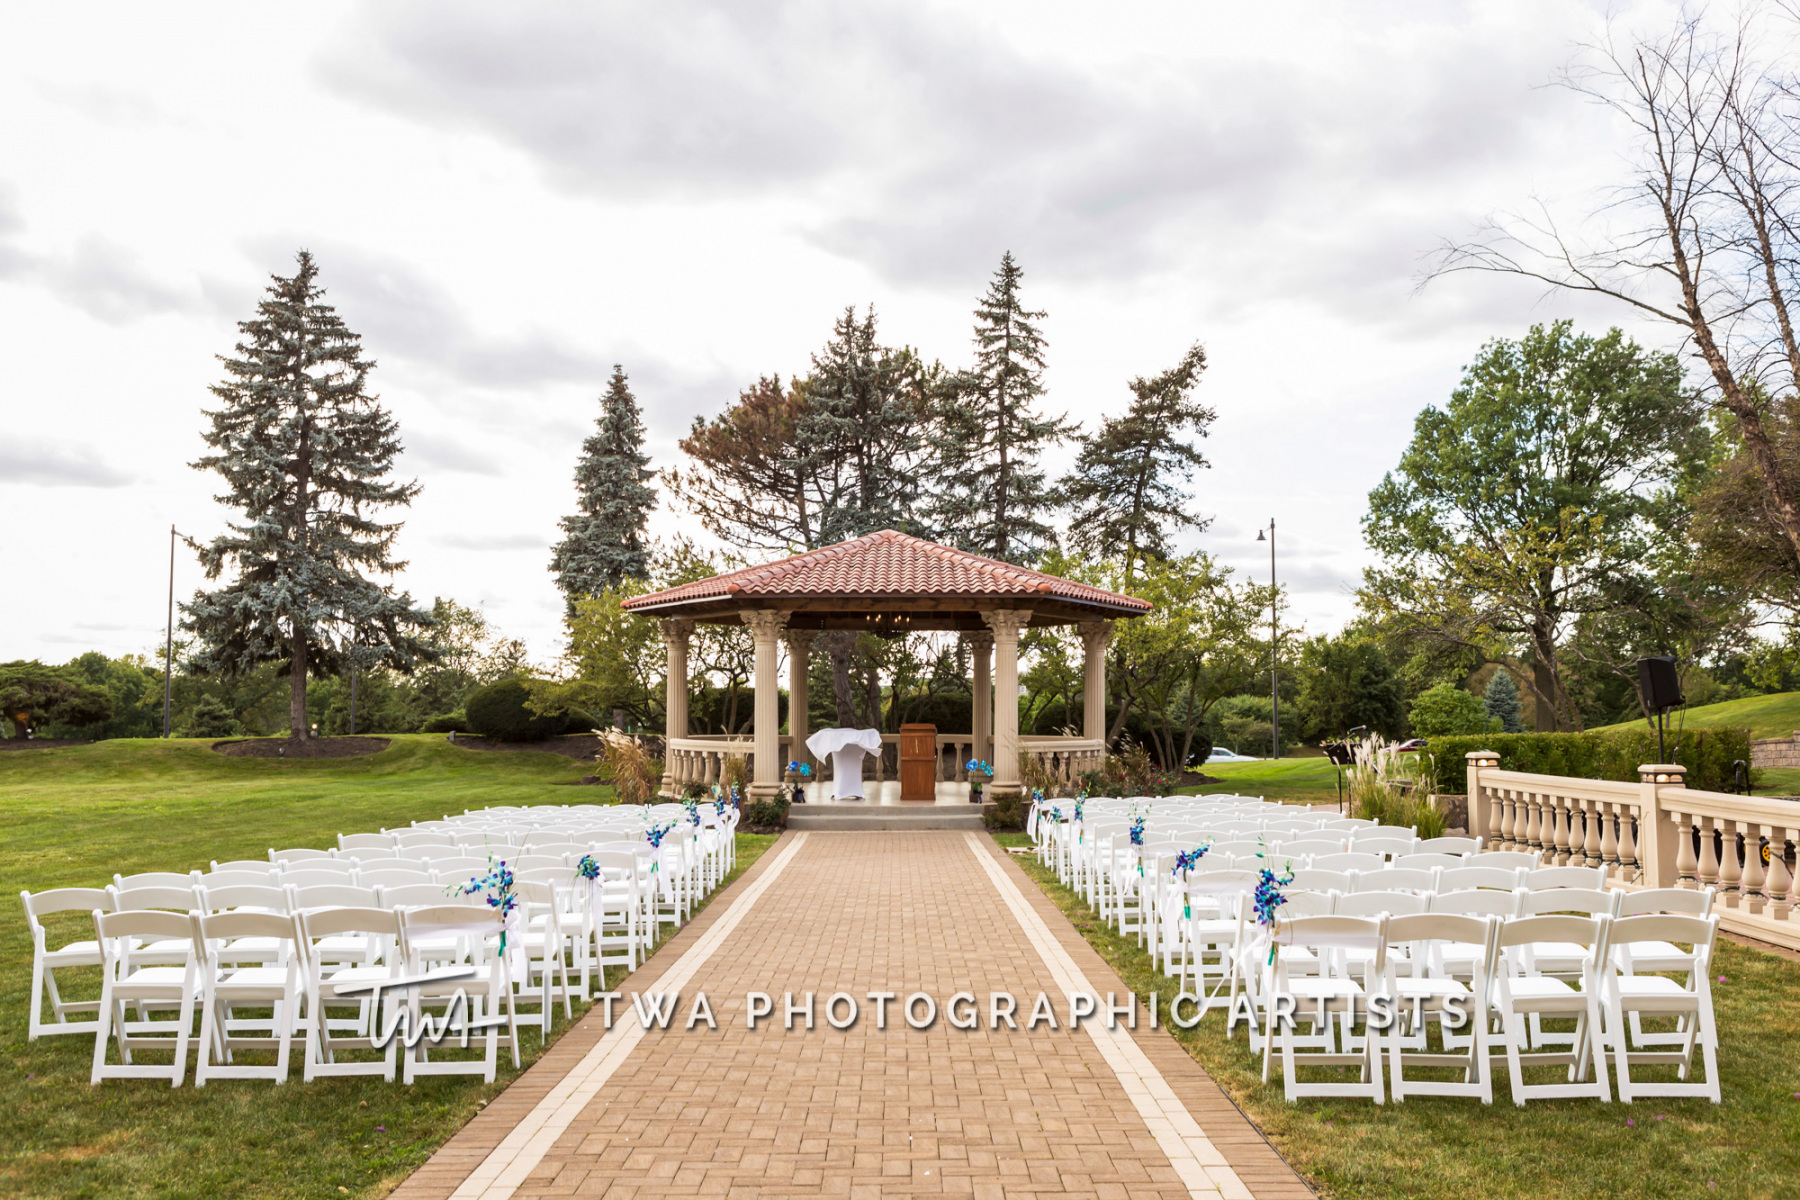 Chicago-Wedding-Photographer-TWA-Photographic-Artists-Drake-Oak-Brook_Church_Panek_HM-0419